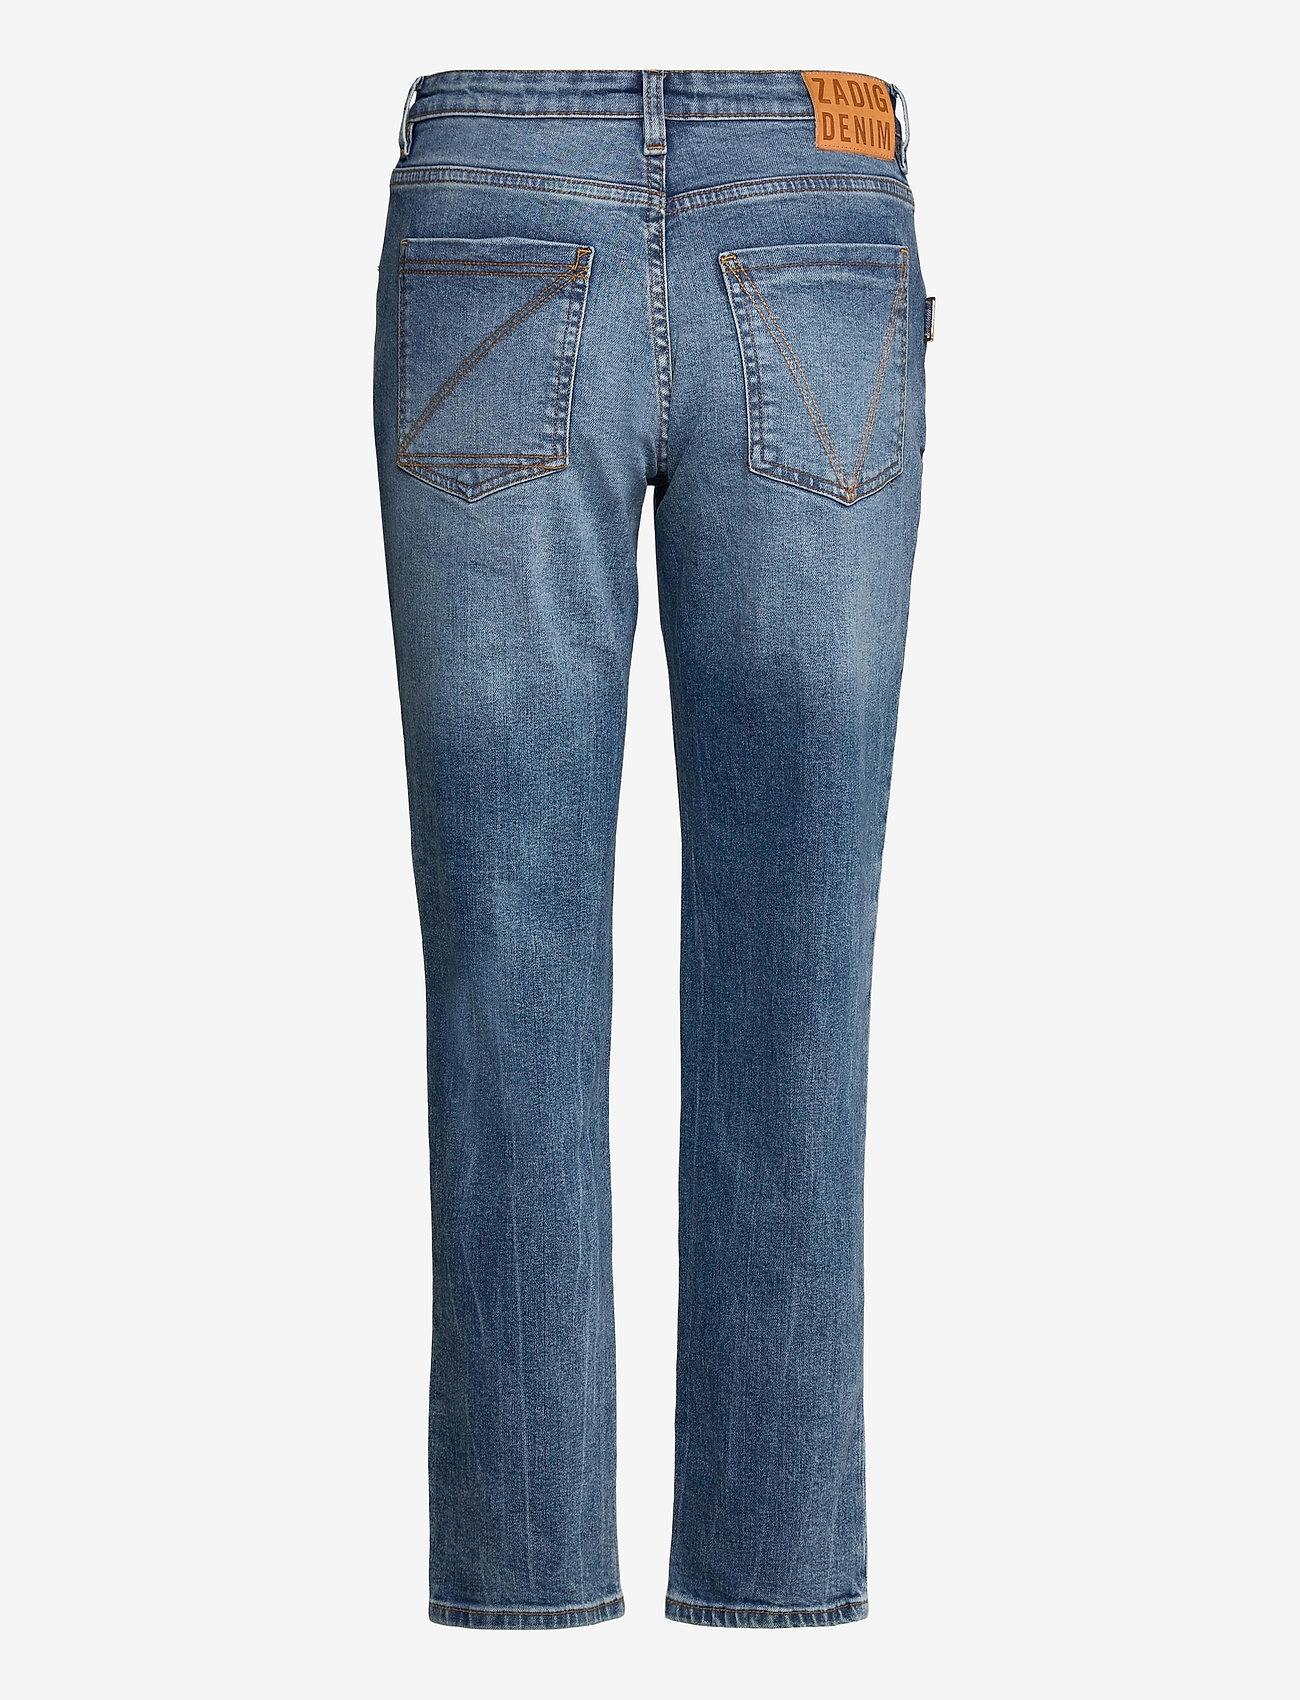 Zadig & Voltaire - MAMMA DENIM ECO LIGHT DENIM - straight jeans - light blue - 2